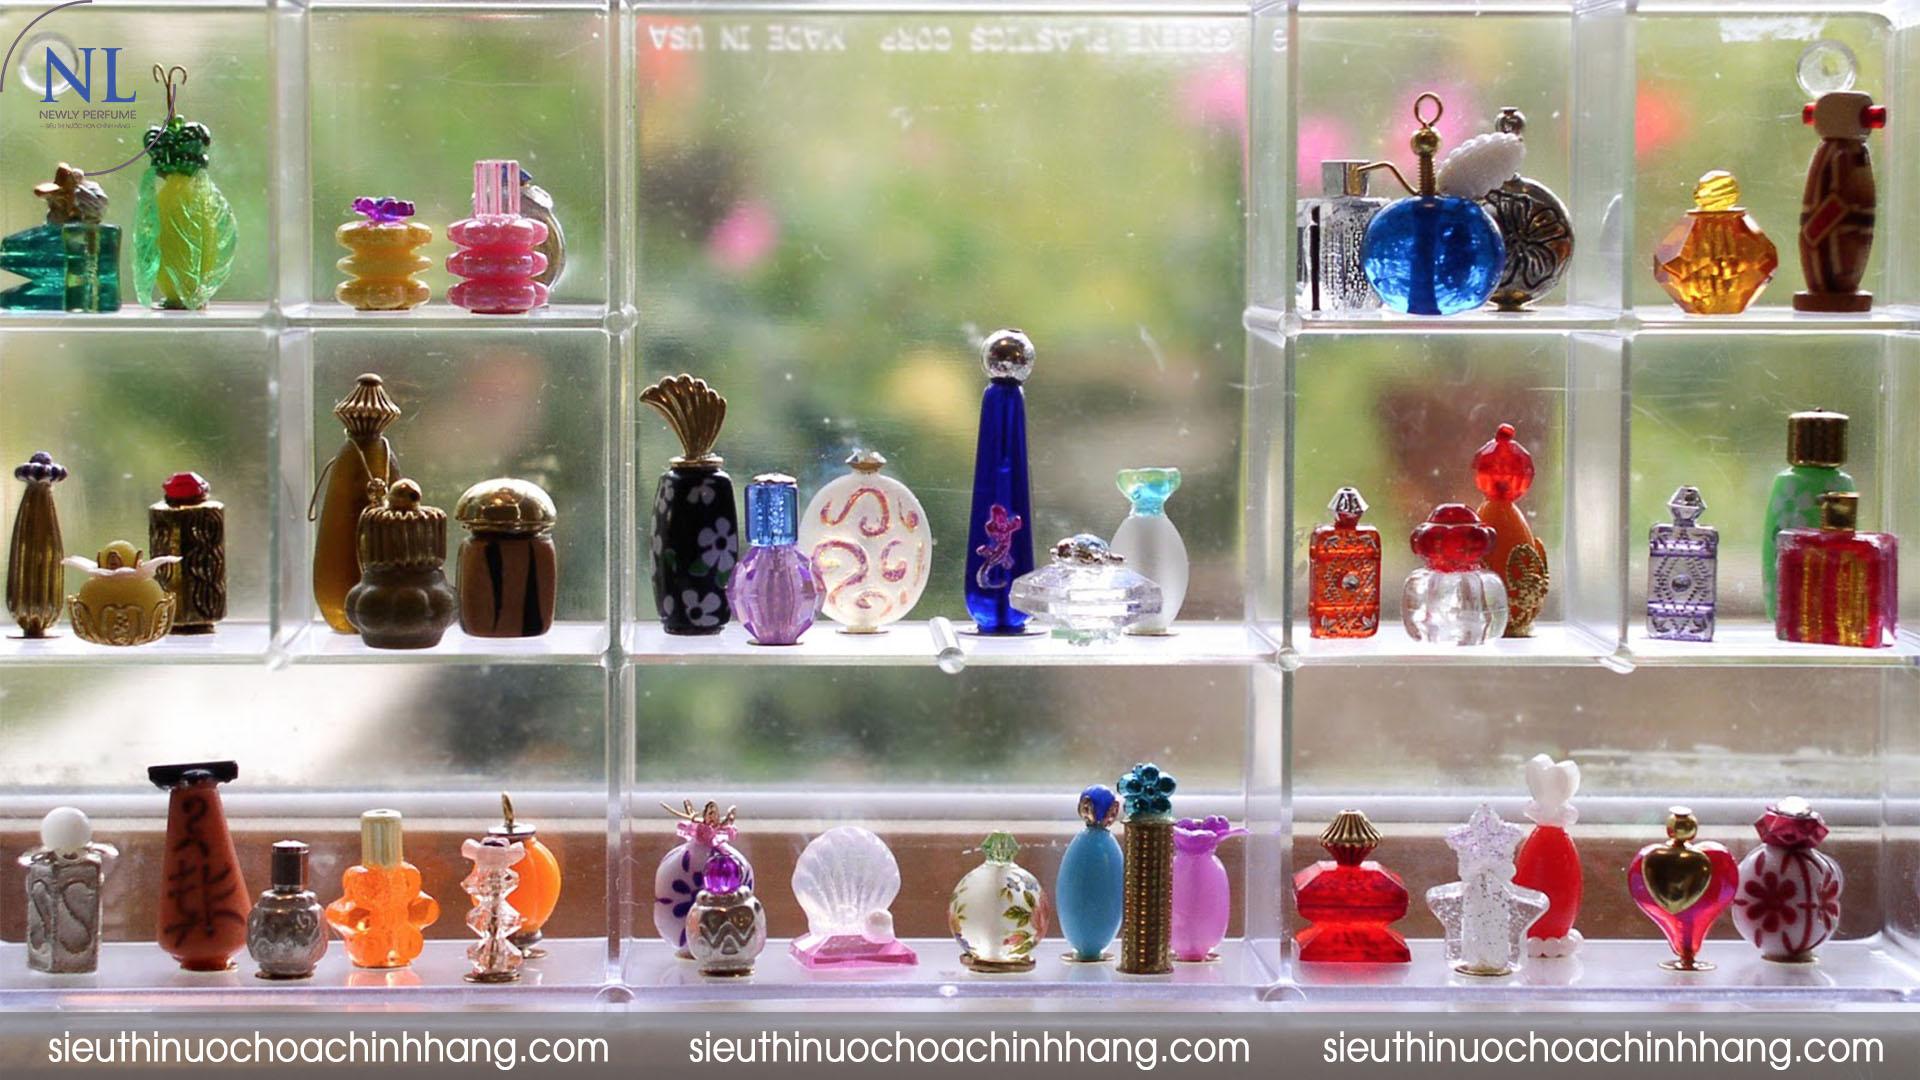 kinh doanh nước hoa charme